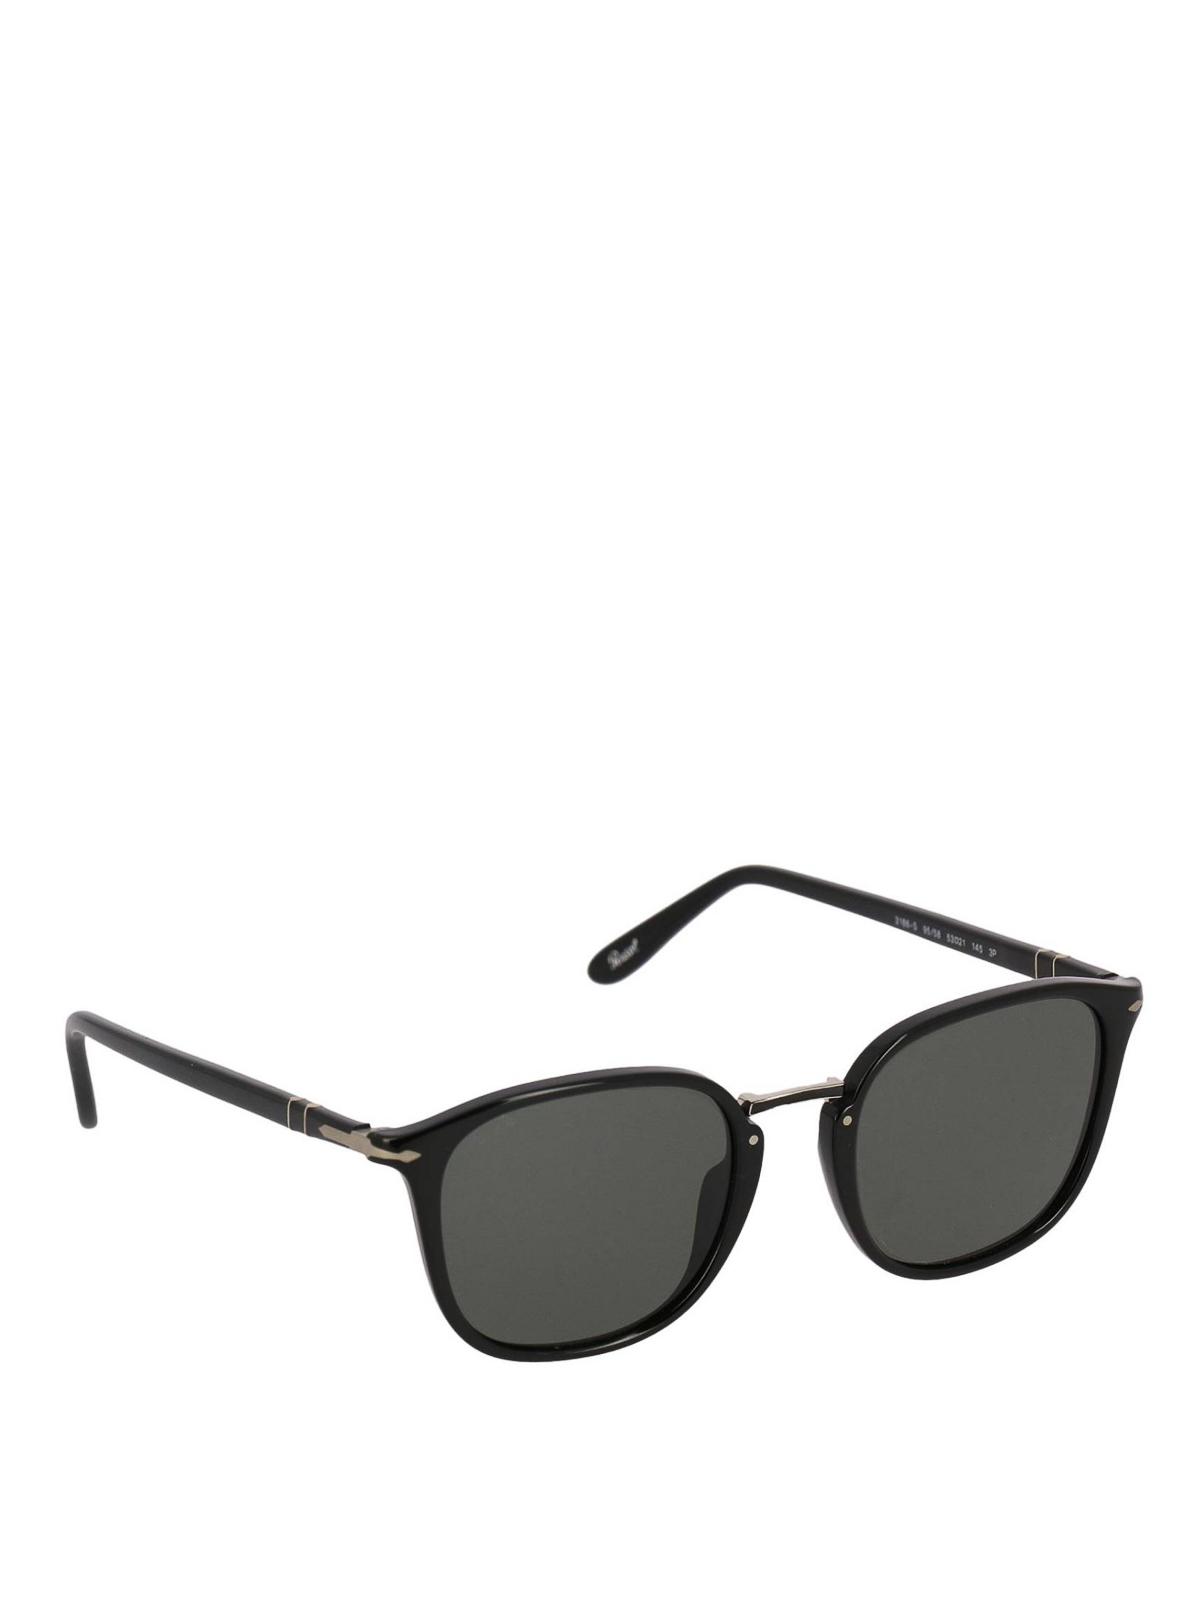 b249c7097d3 Persol - Black panto sunglasses with metal bridge - sunglasses ...